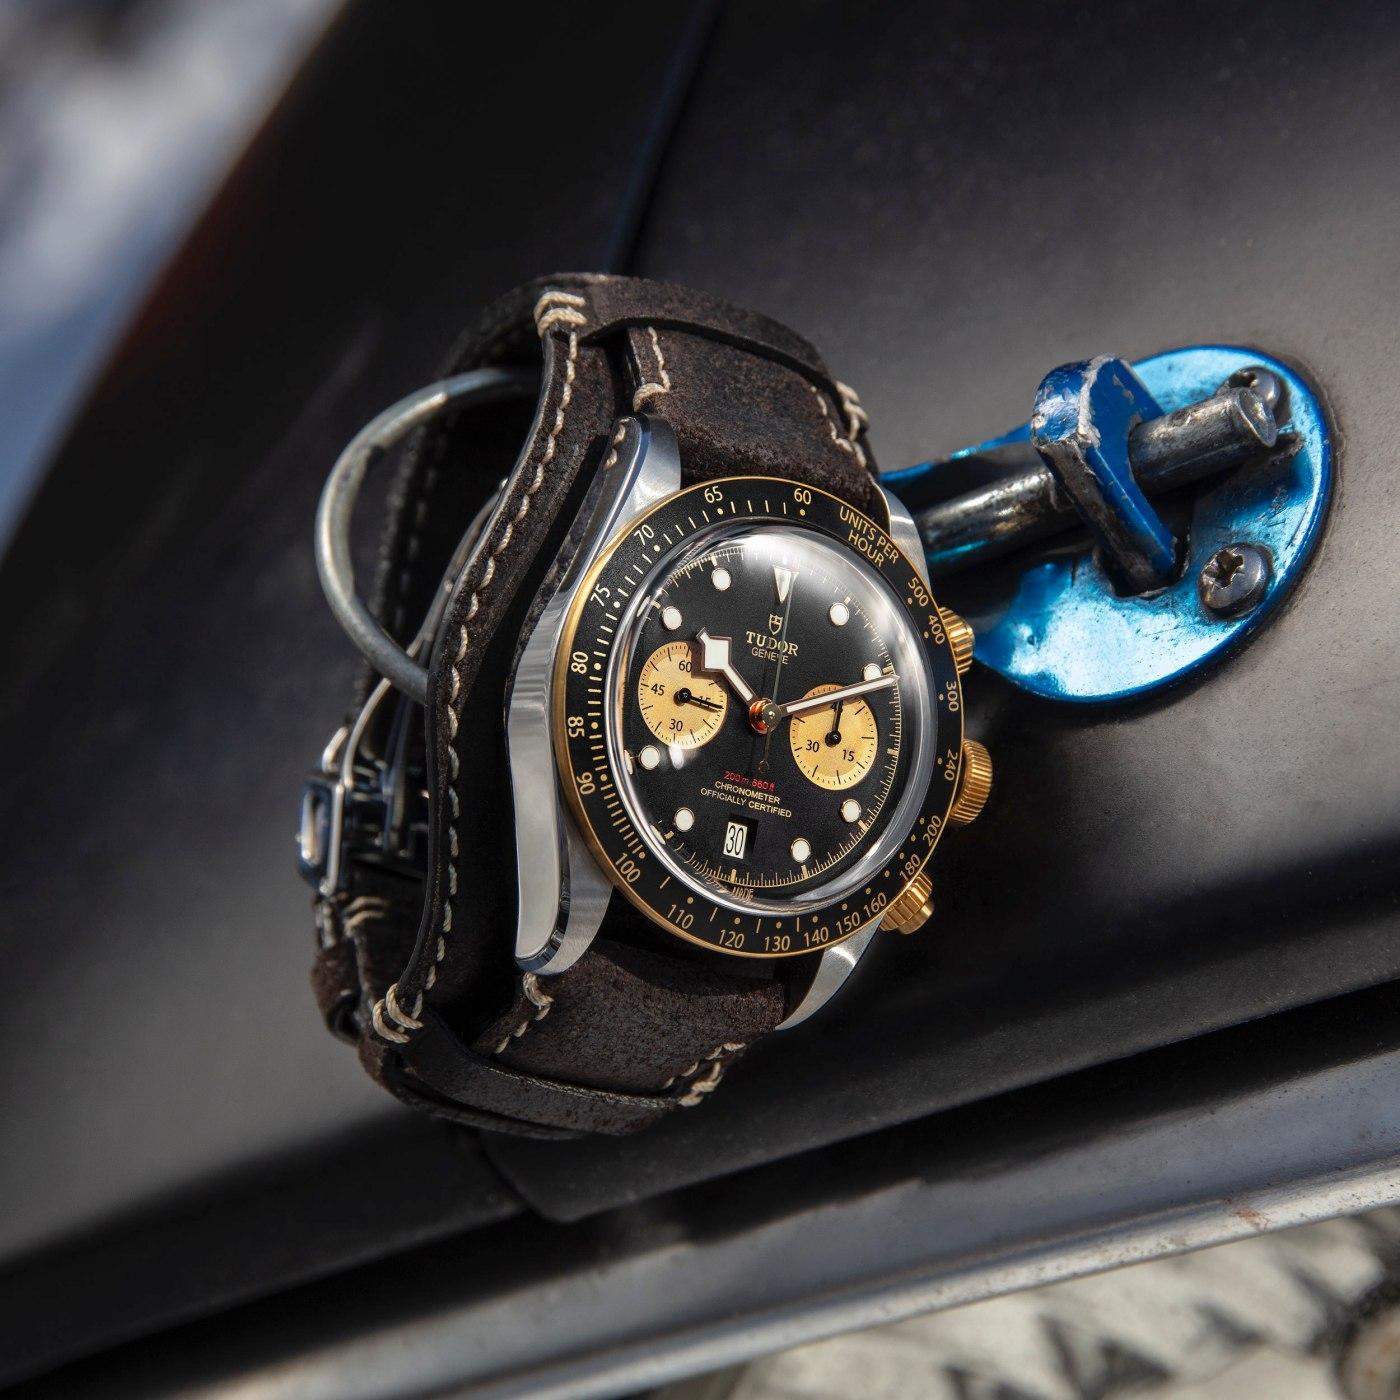 Two-Tone Tudor Black Bay Chrono on brown leather bund strap